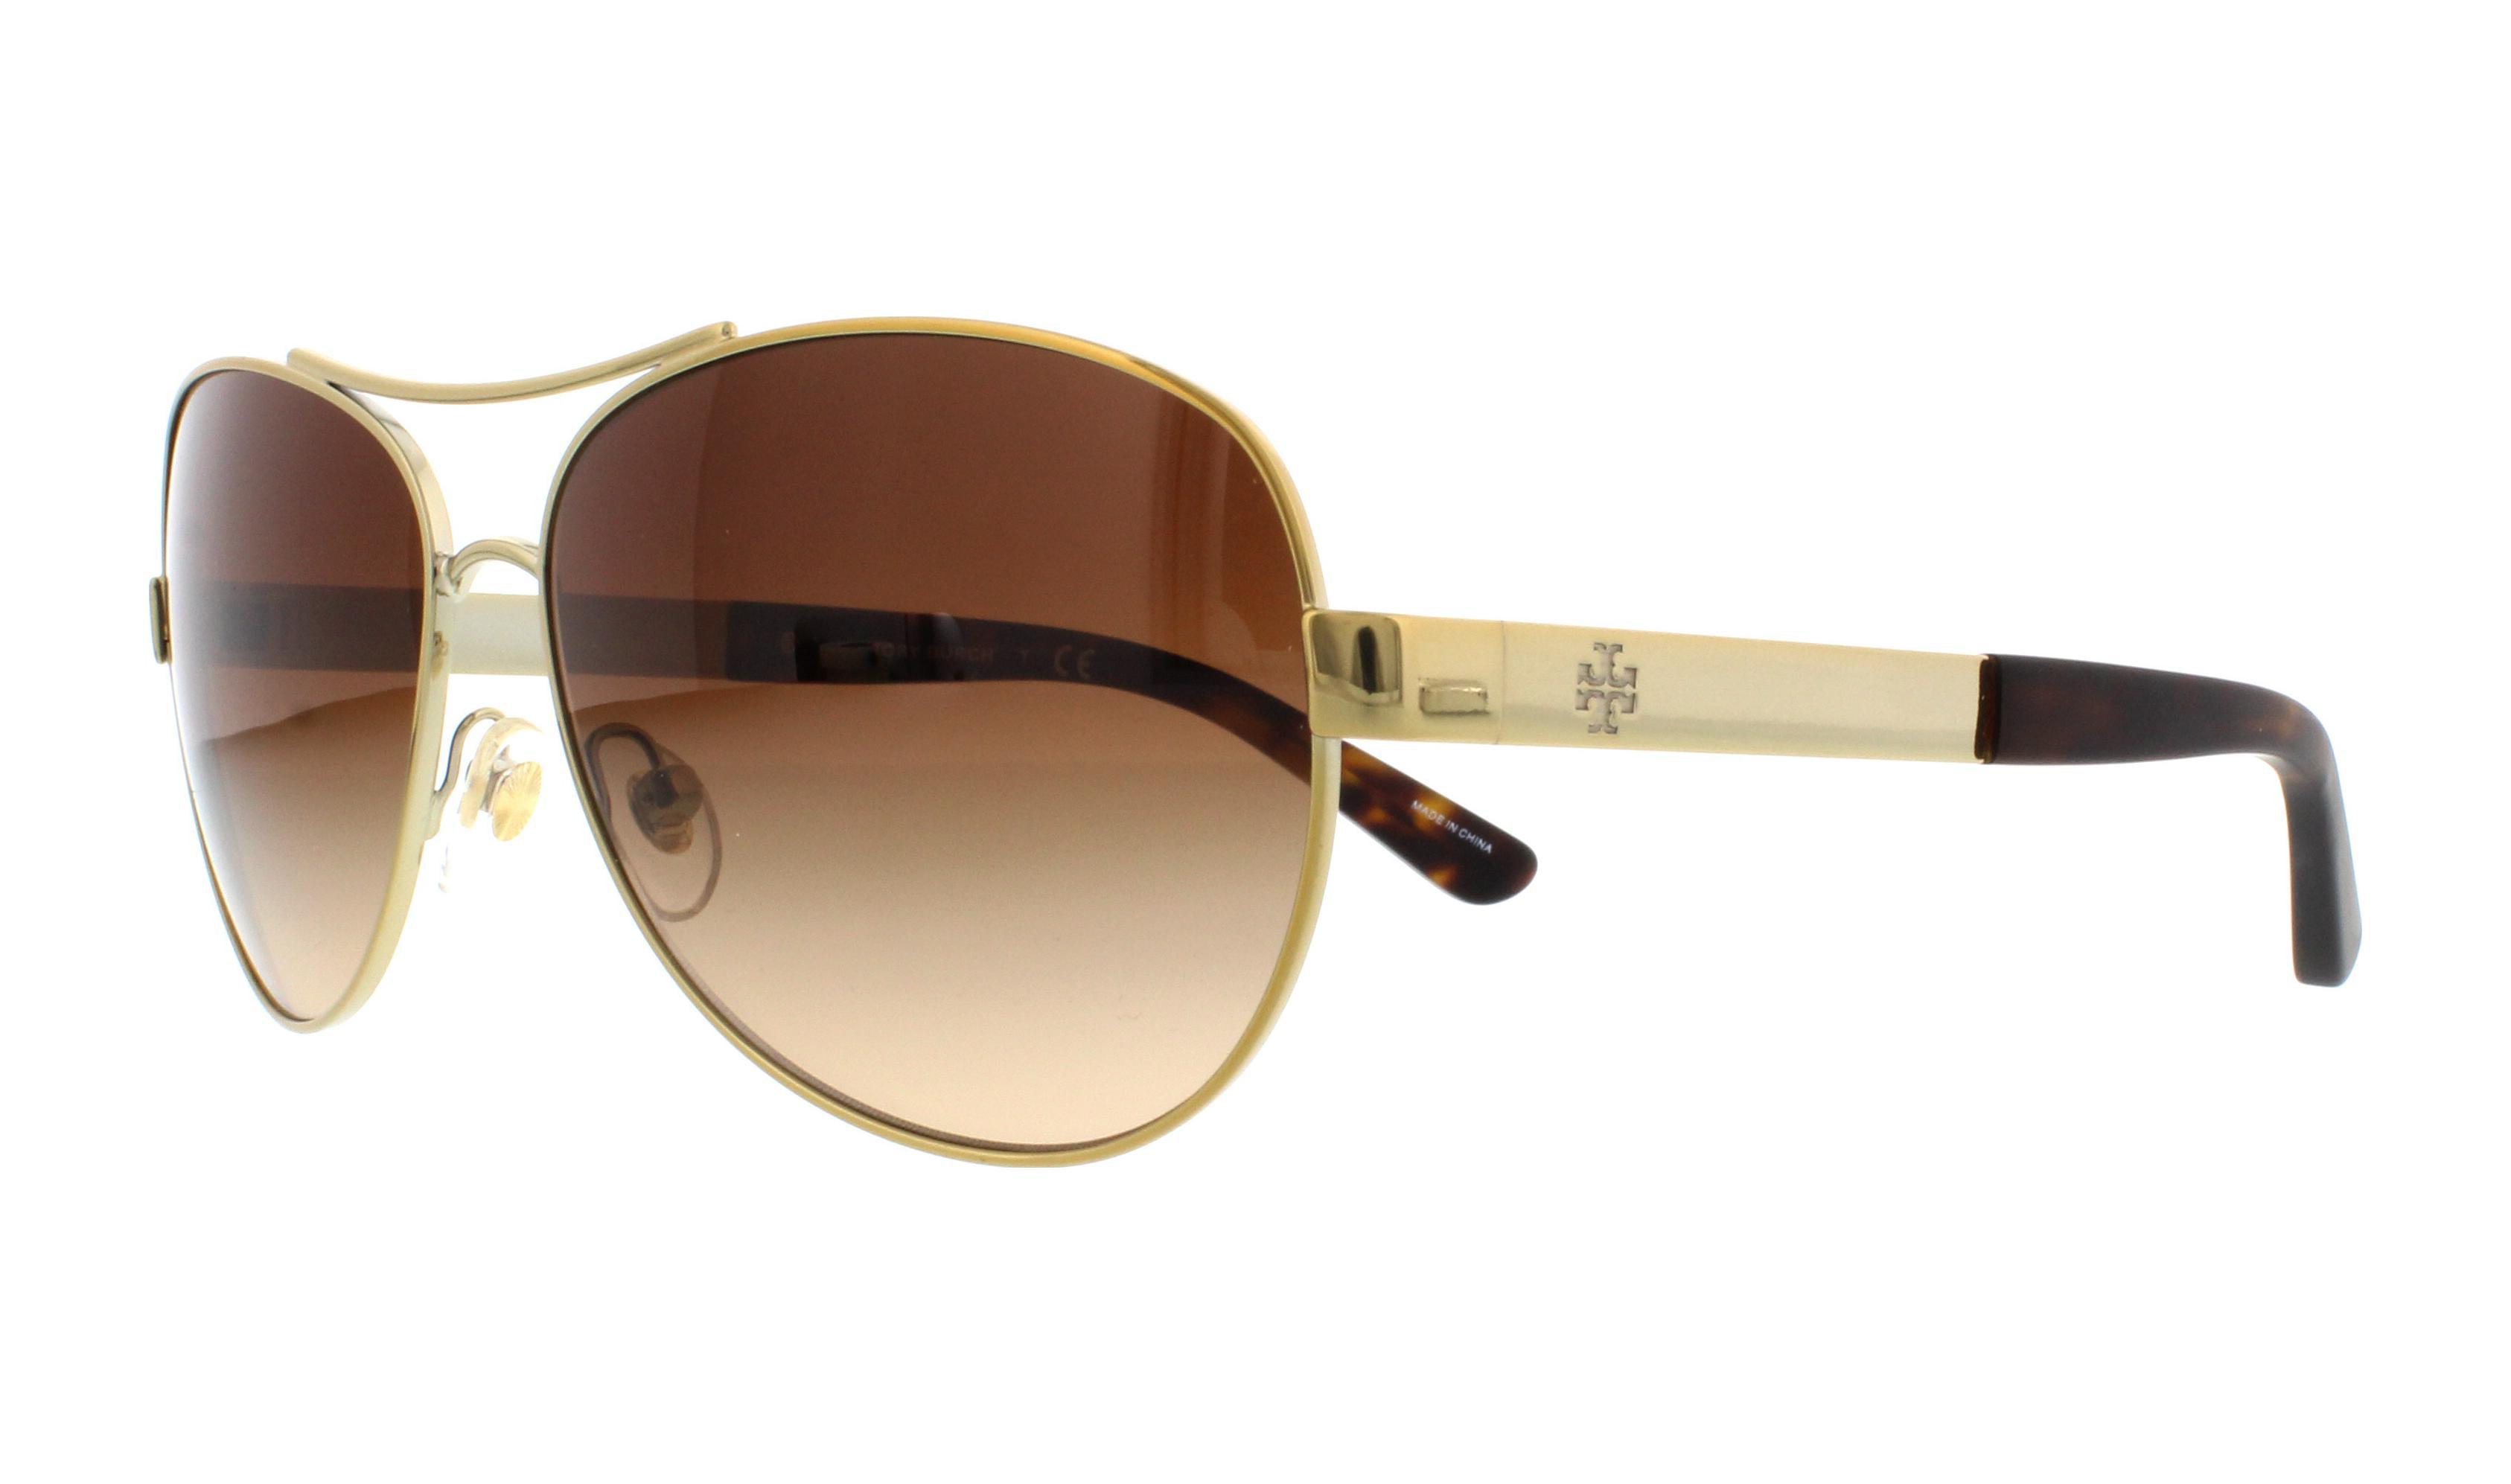 de02623652ea Tory Burch - TORY BURCH Sunglasses TY6047 316013 Gold 59MM - Walmart.com